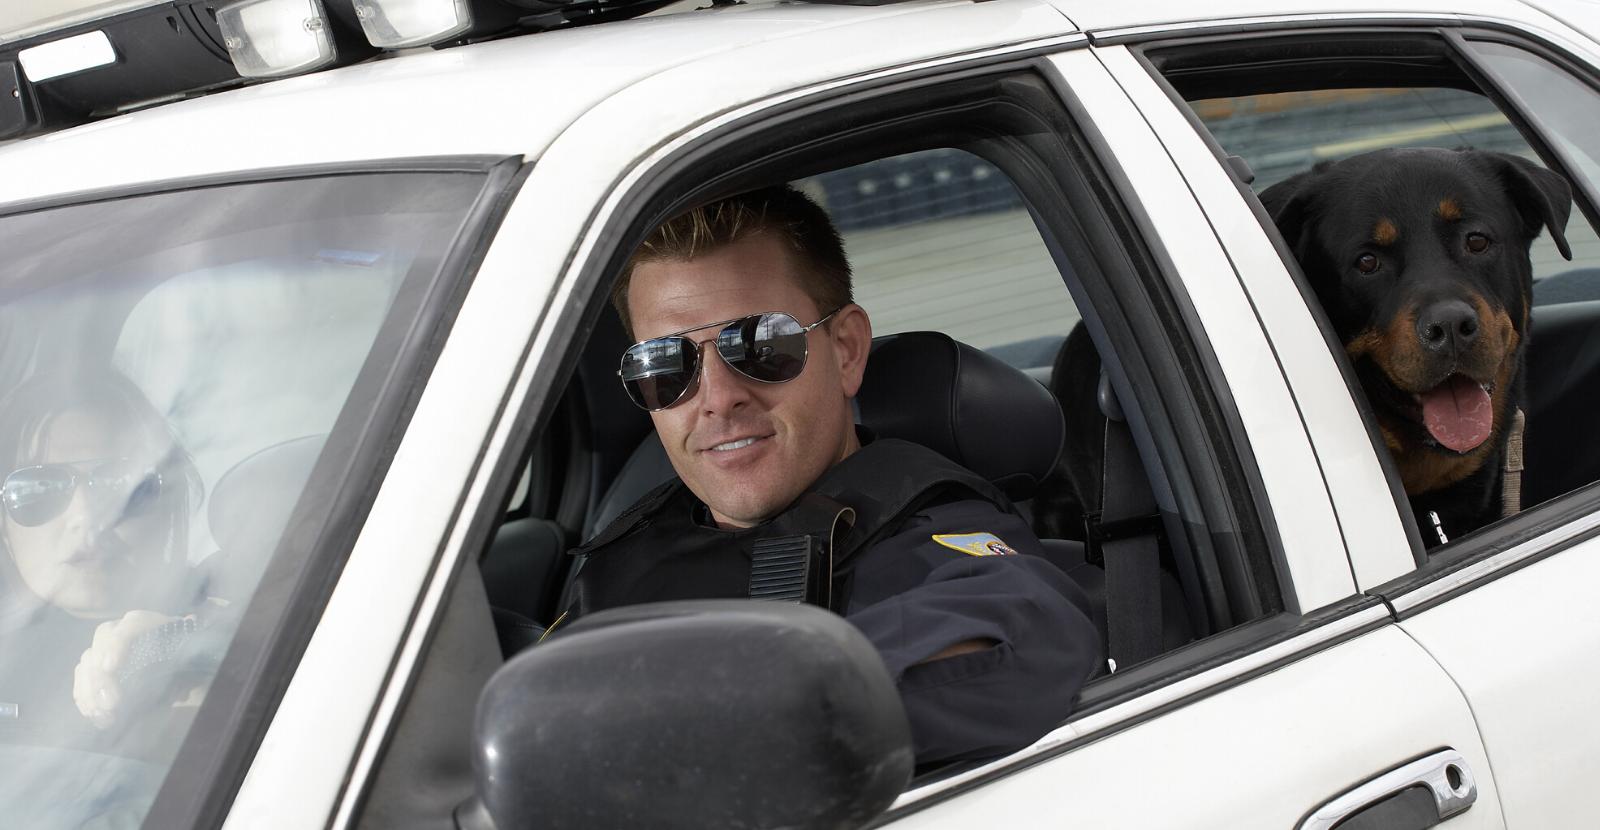 Police Rottie